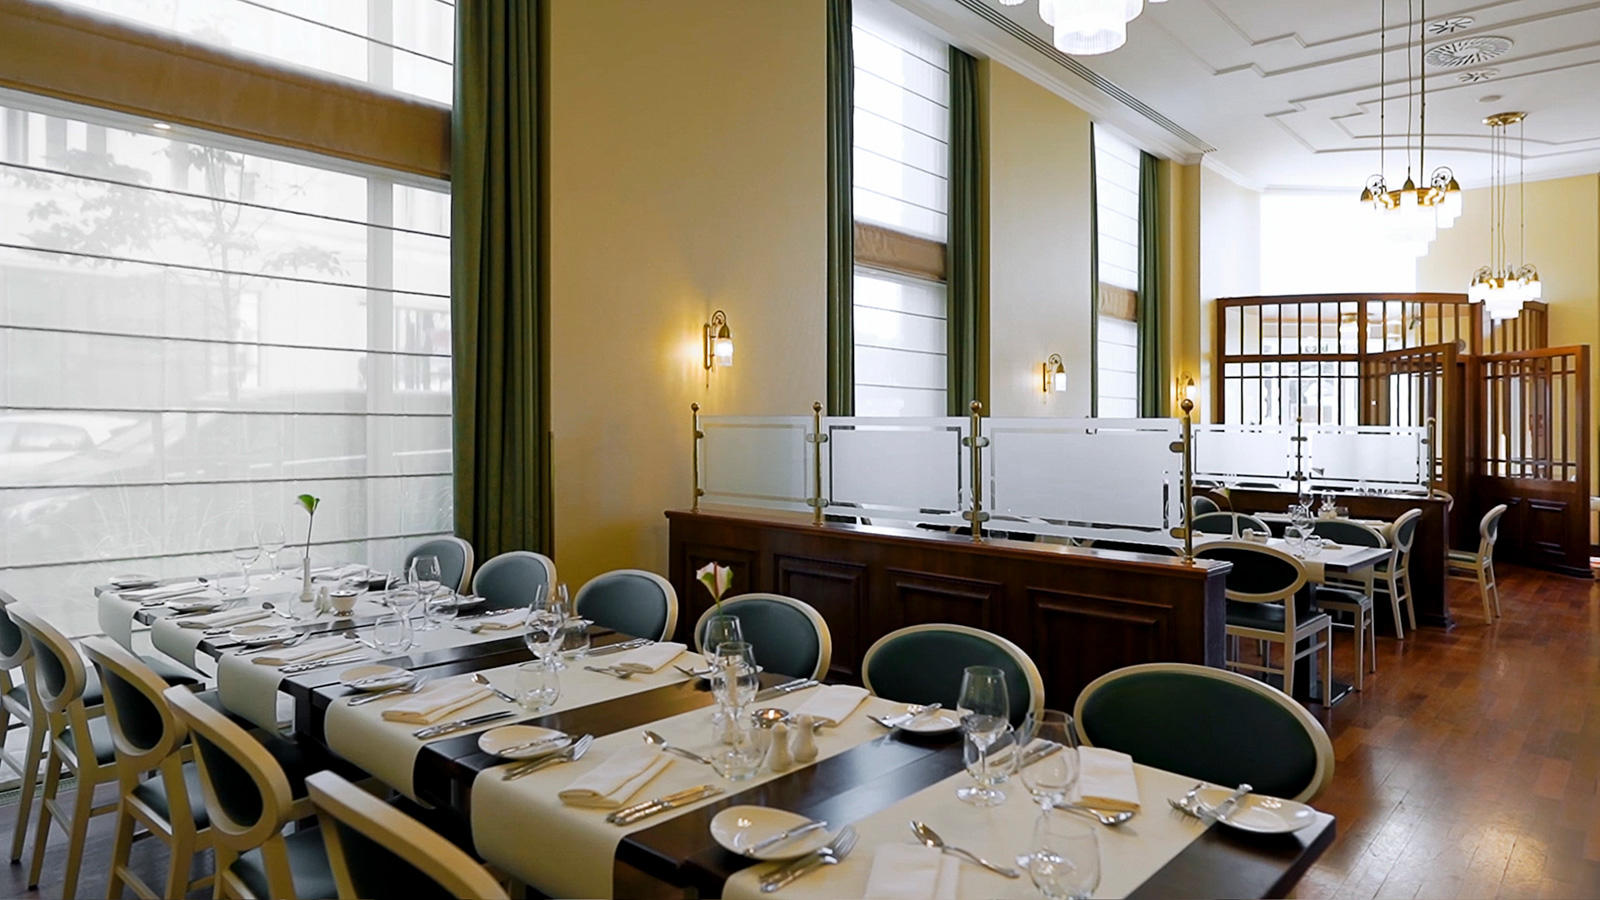 Polonia Restaurant at Polonia Palace Hotel, Warsaw